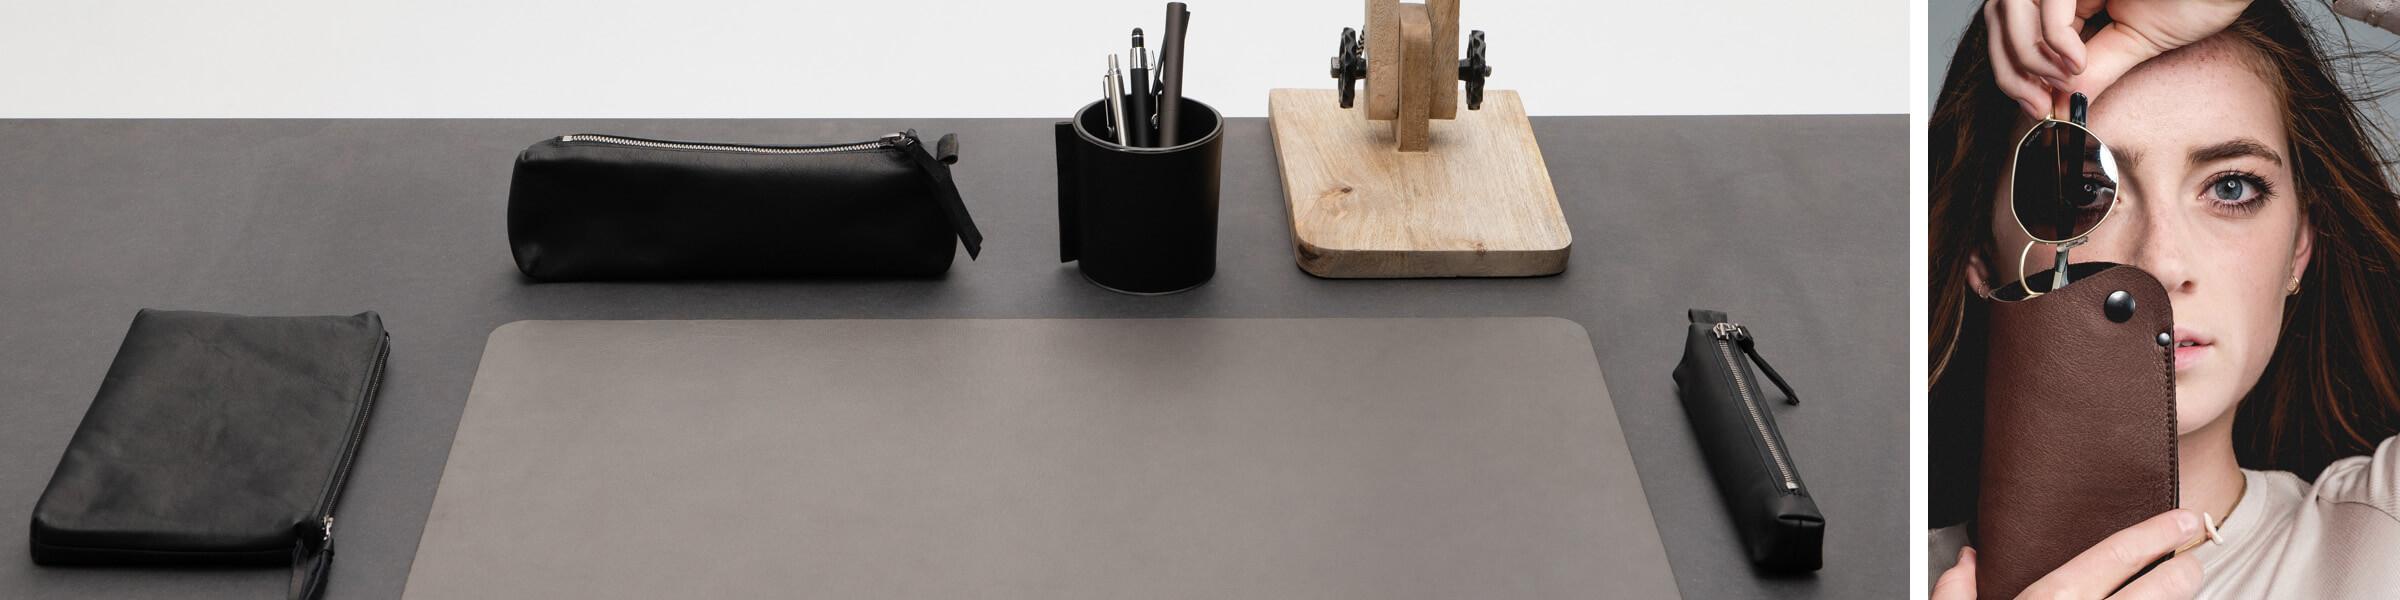 Bürozubehör Leder  Büroausstattung Leder  Schreibwaren Leder   Büroequipment Leder  Wunschleder